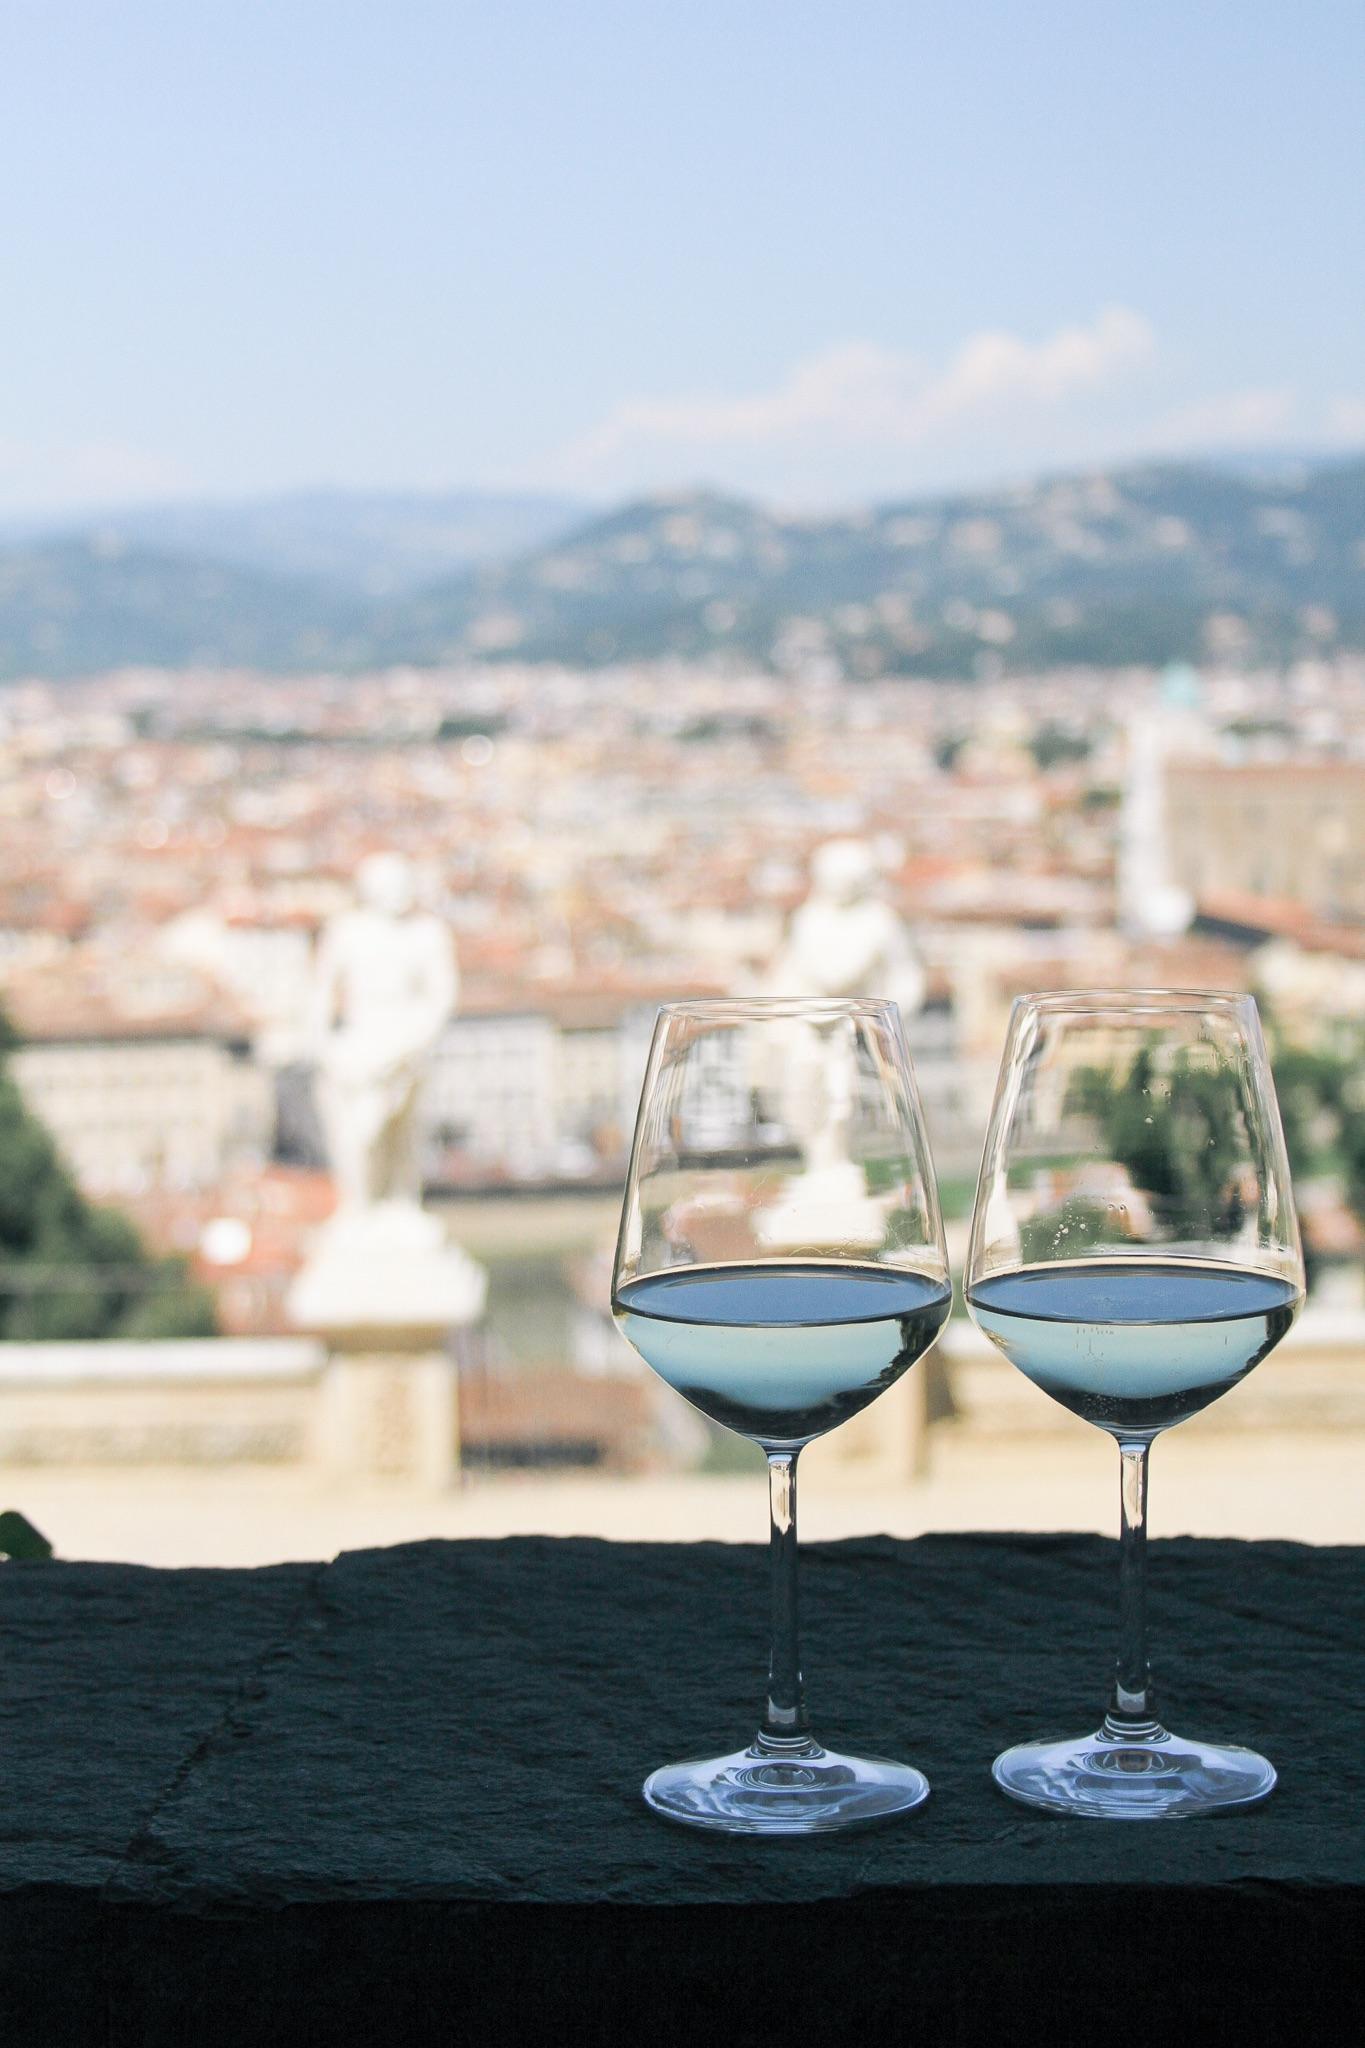 Ten-Days-Florence-Tuscany-Travel-Guide-MonicaFrancis-2